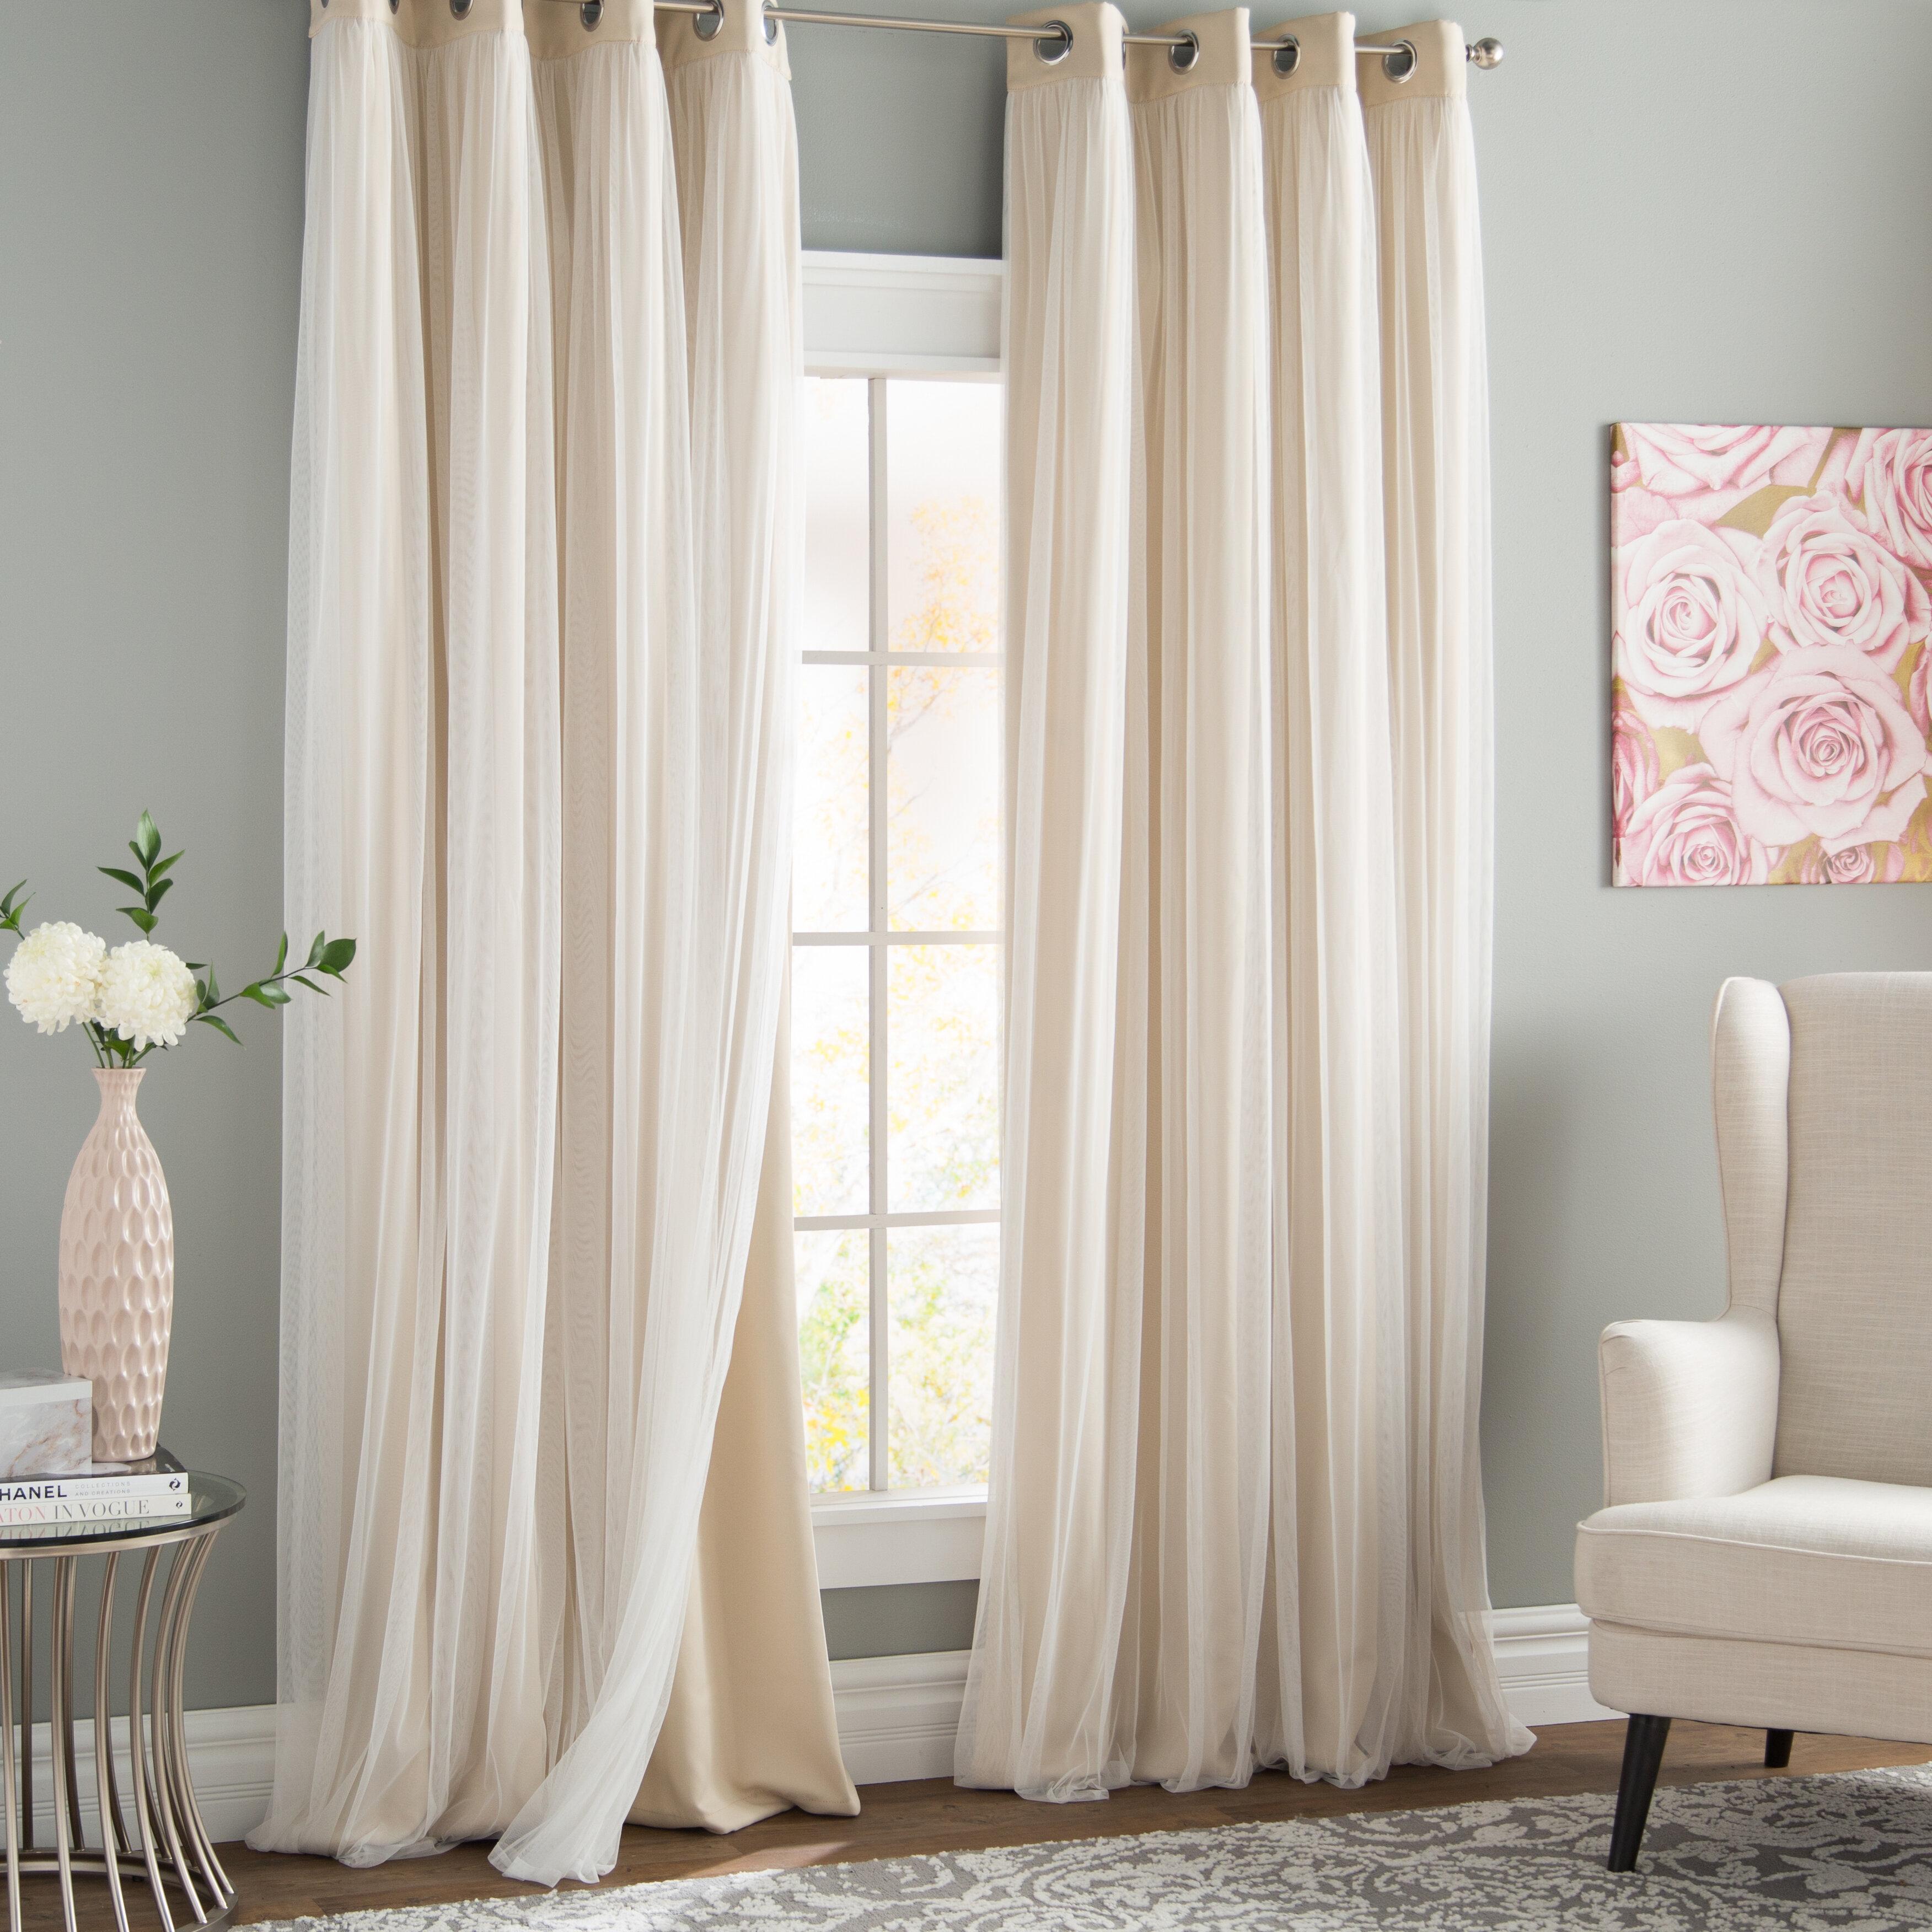 Brockham Blackout Thermal Grommet Curtain Panels intended for Grommet Curtain Panels (Image 5 of 20)